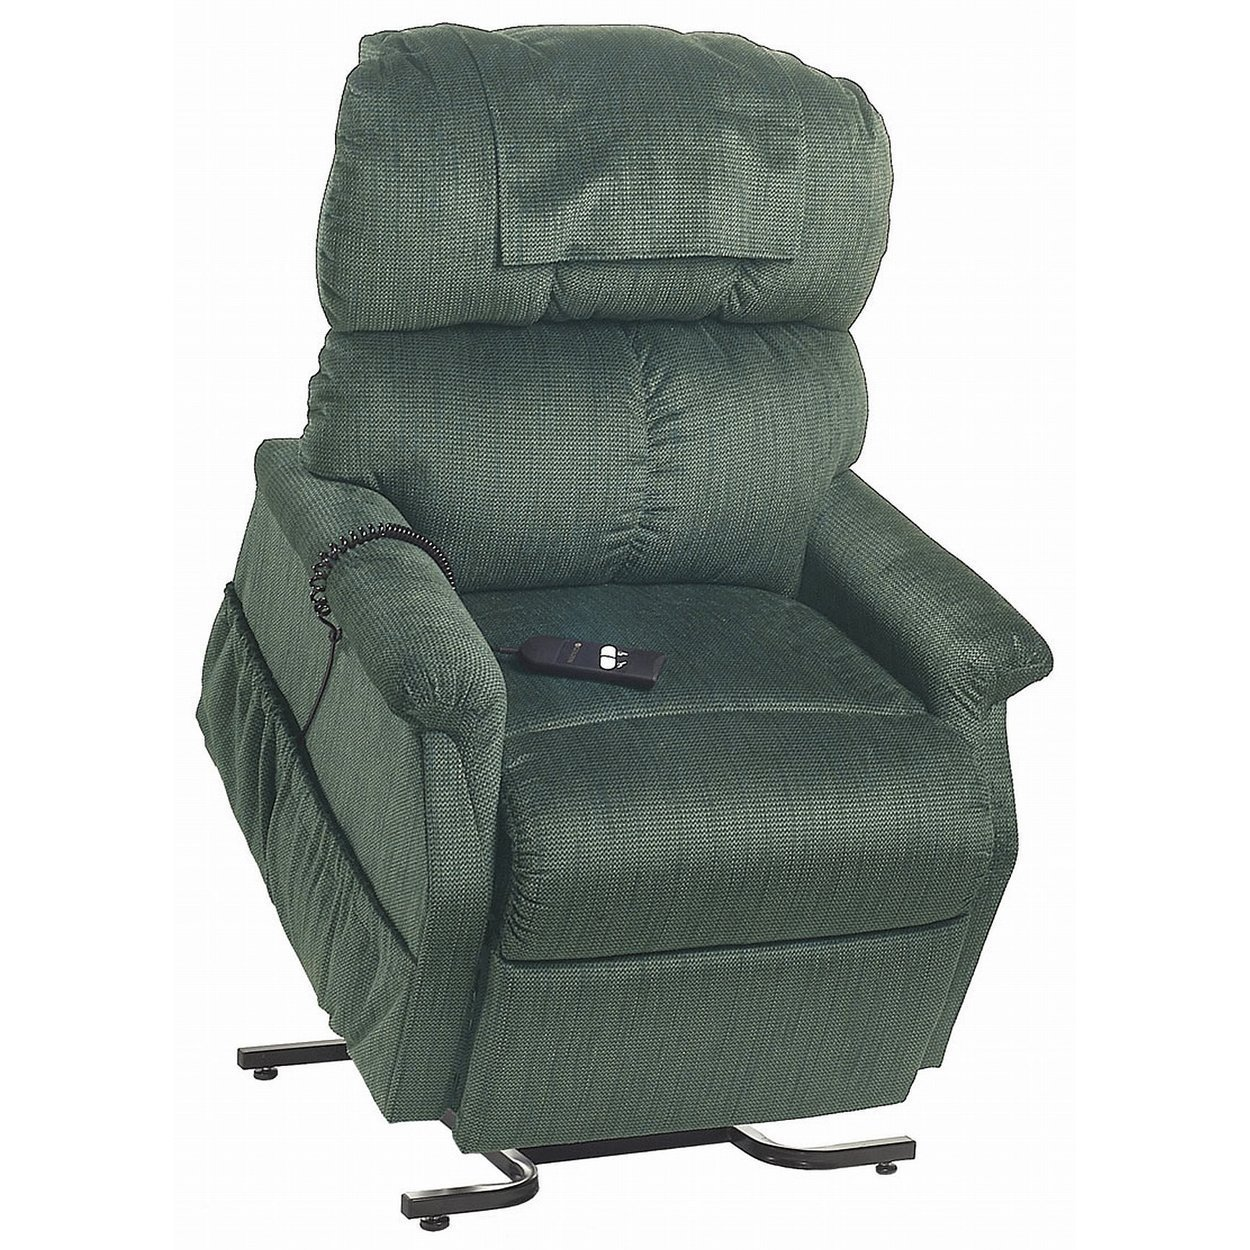 Golden Comforter Wide Super 33 (PR502) Lift Chair Parts